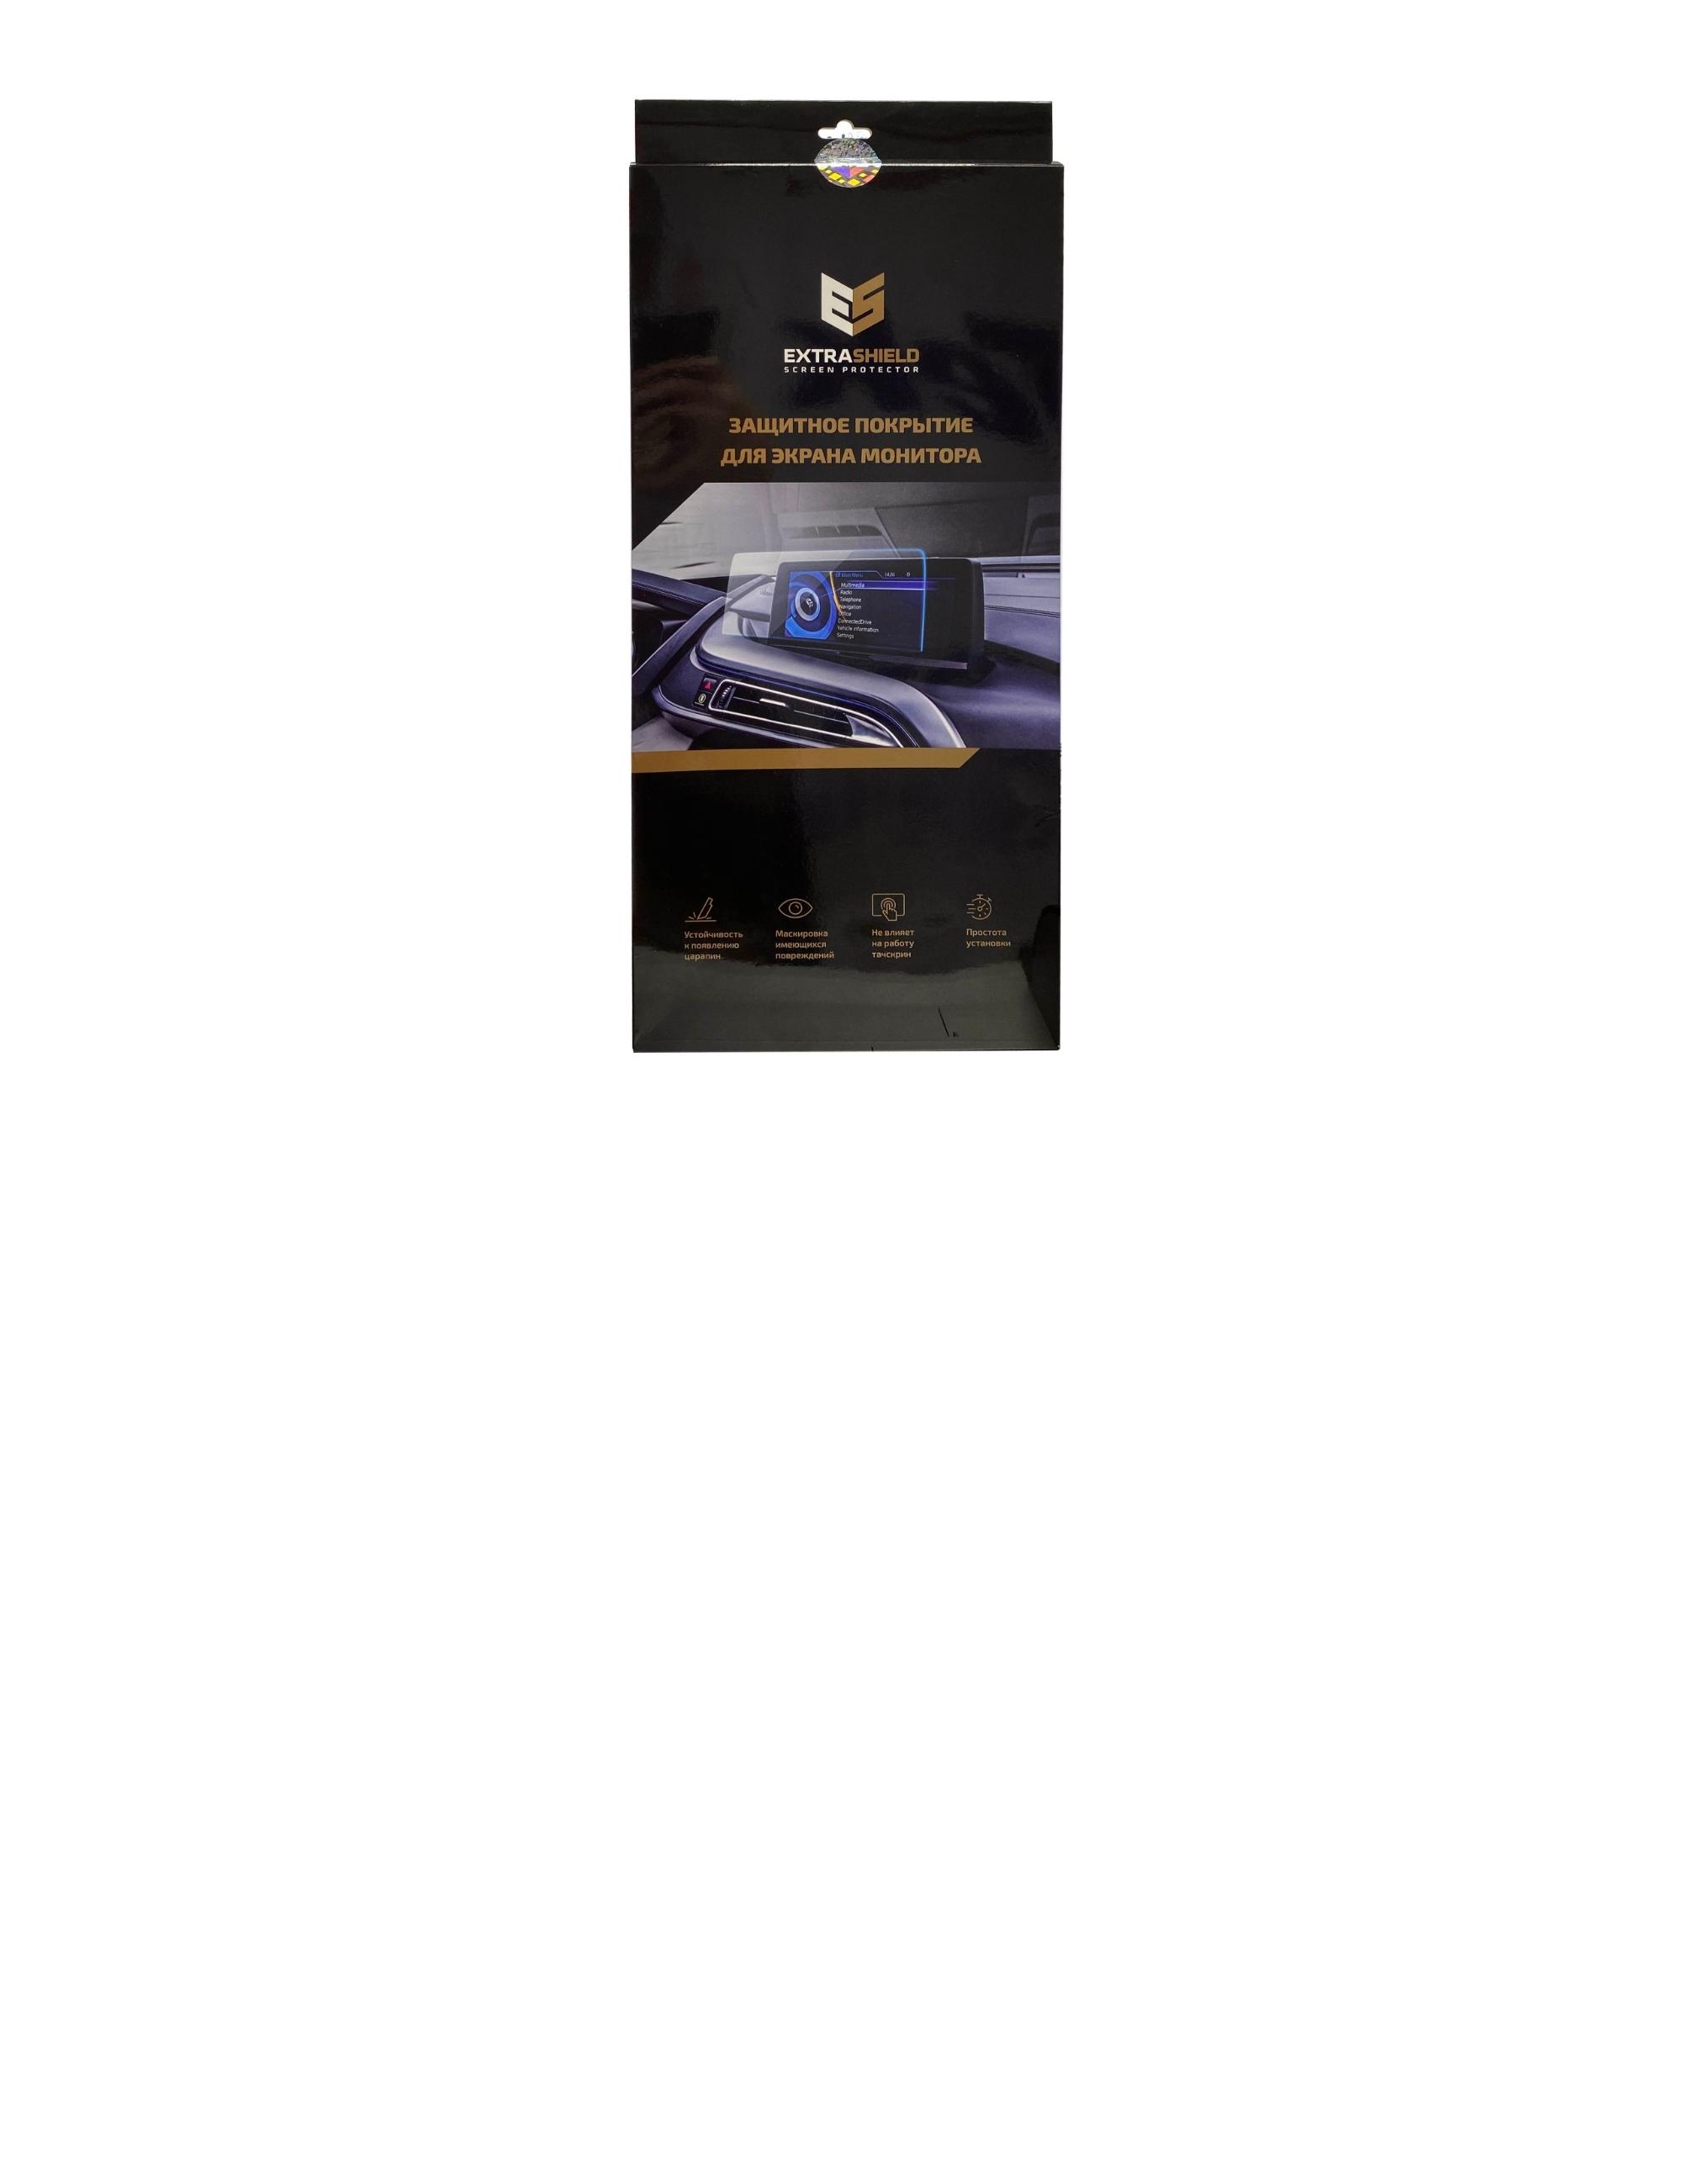 Bentley Continental GT 2018 - н.в. мультимедиа Bang & Olufsen 12,3 Статическая пленка Матовая